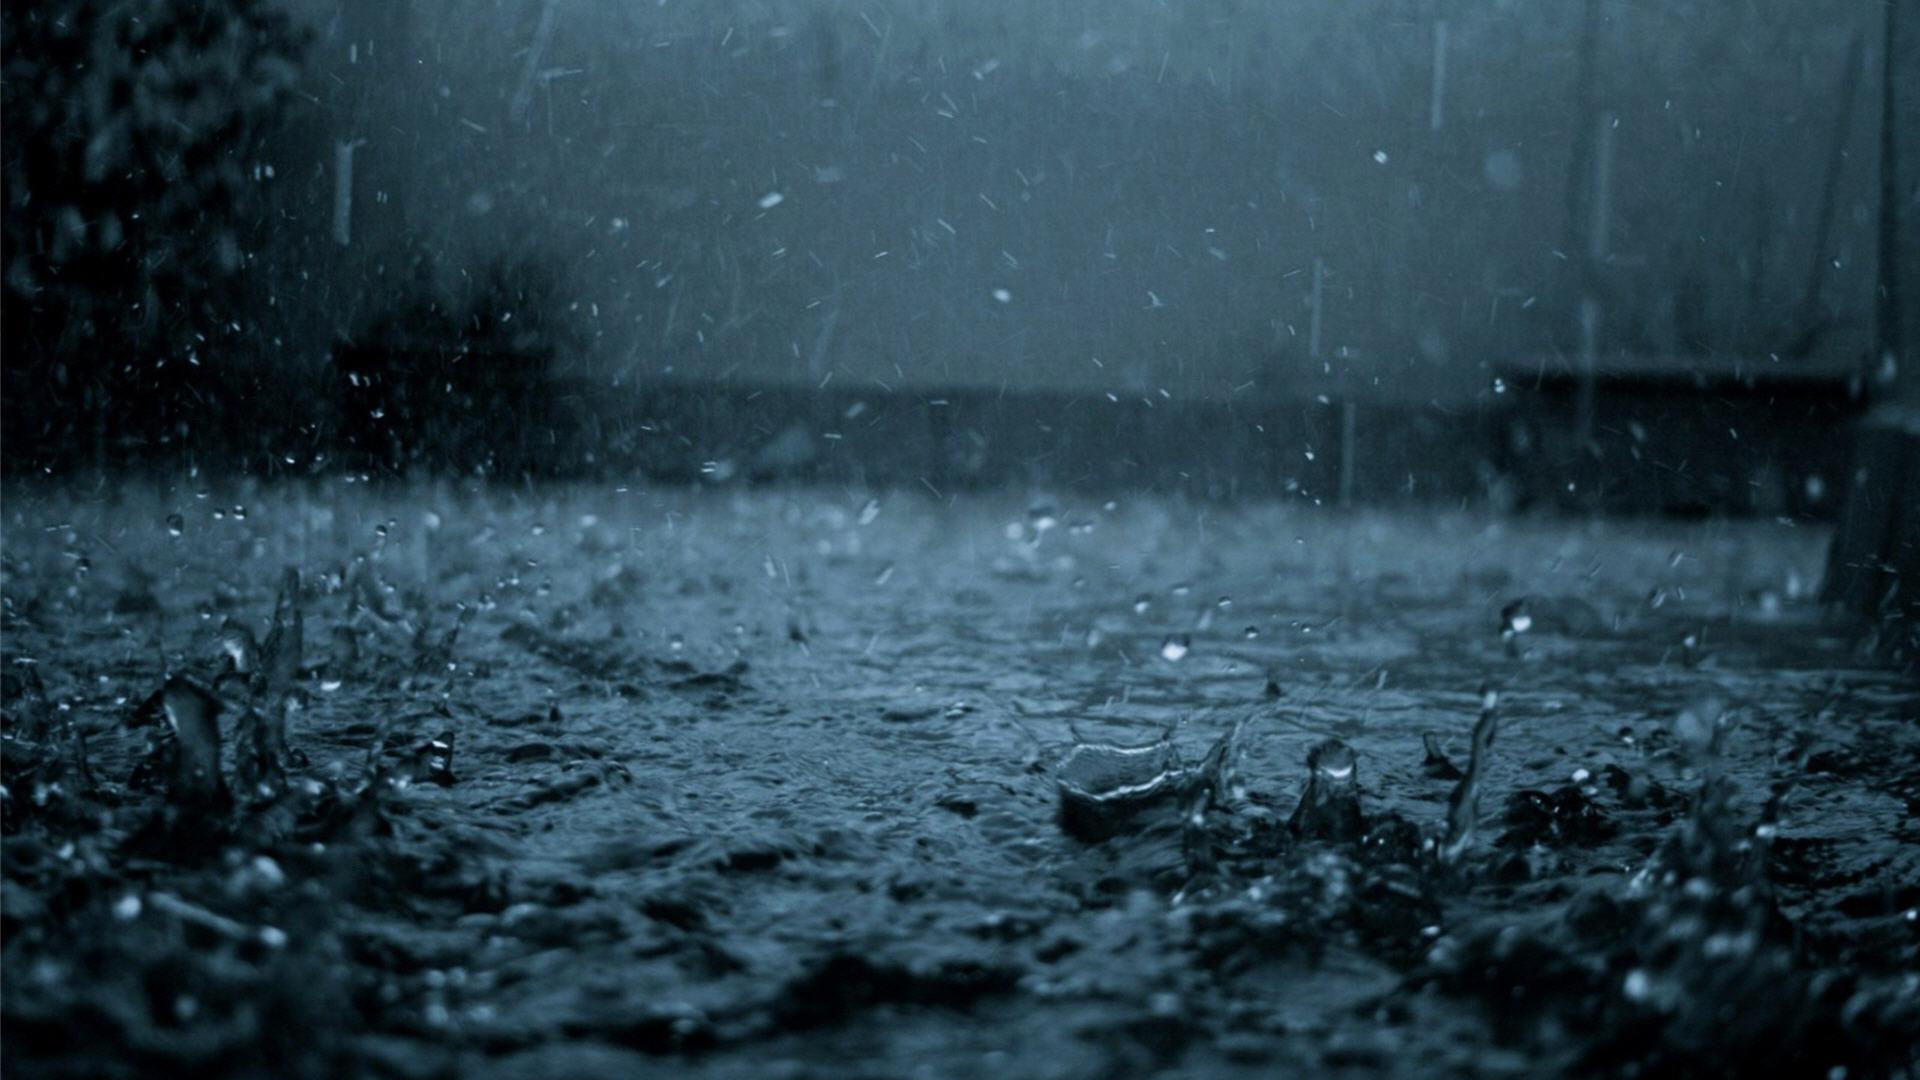 rain-wallpaper-weather-nature-wallpapers-wallpap-screensavers -albums-collectpics-ibackgroundz